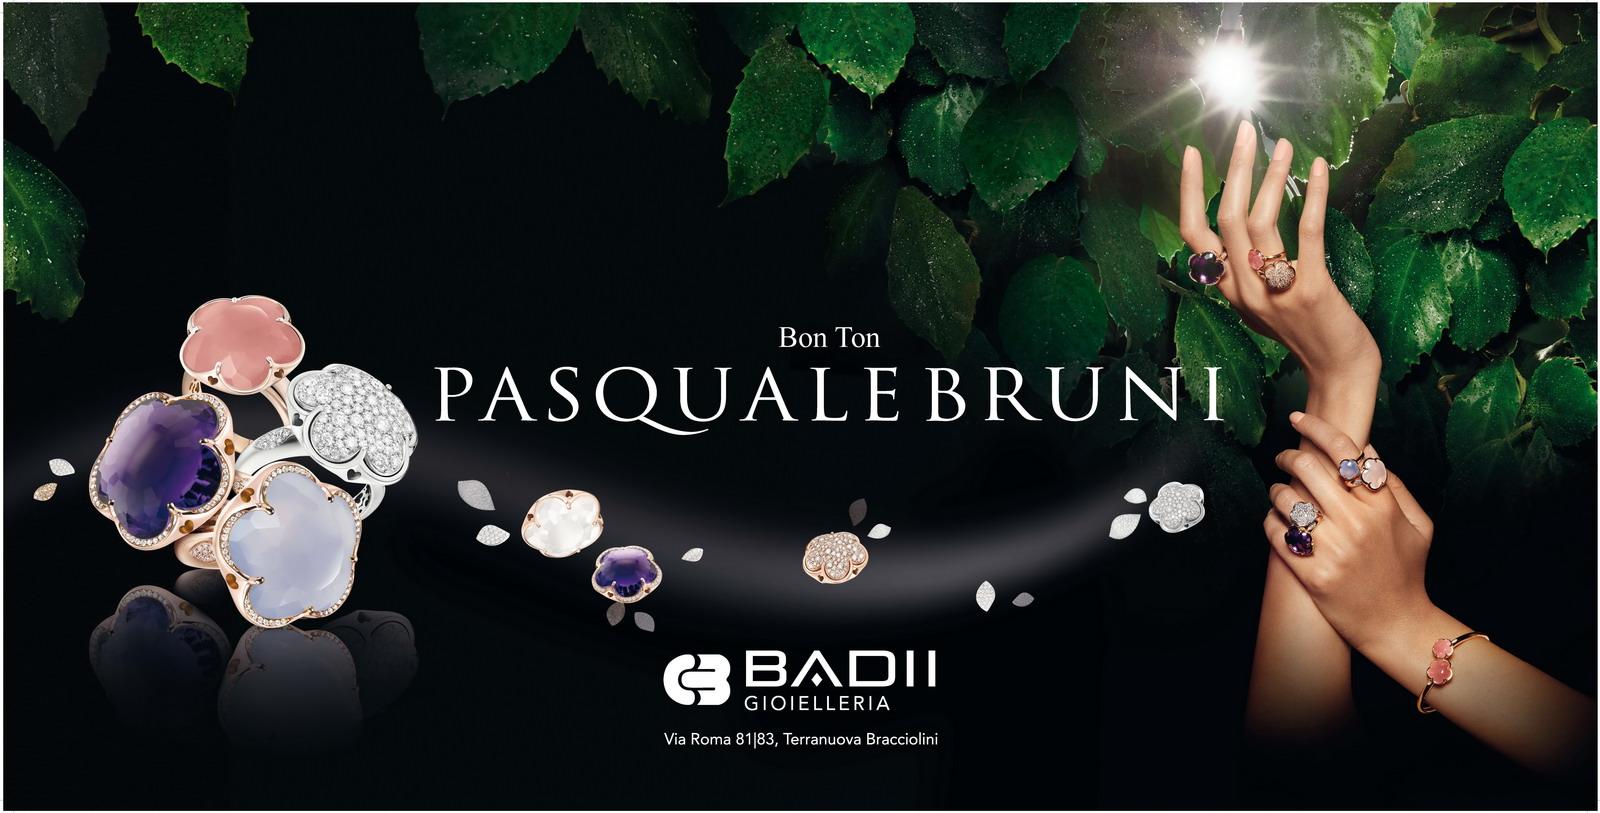 Badii partner esclusivo di Pasquale Bruni